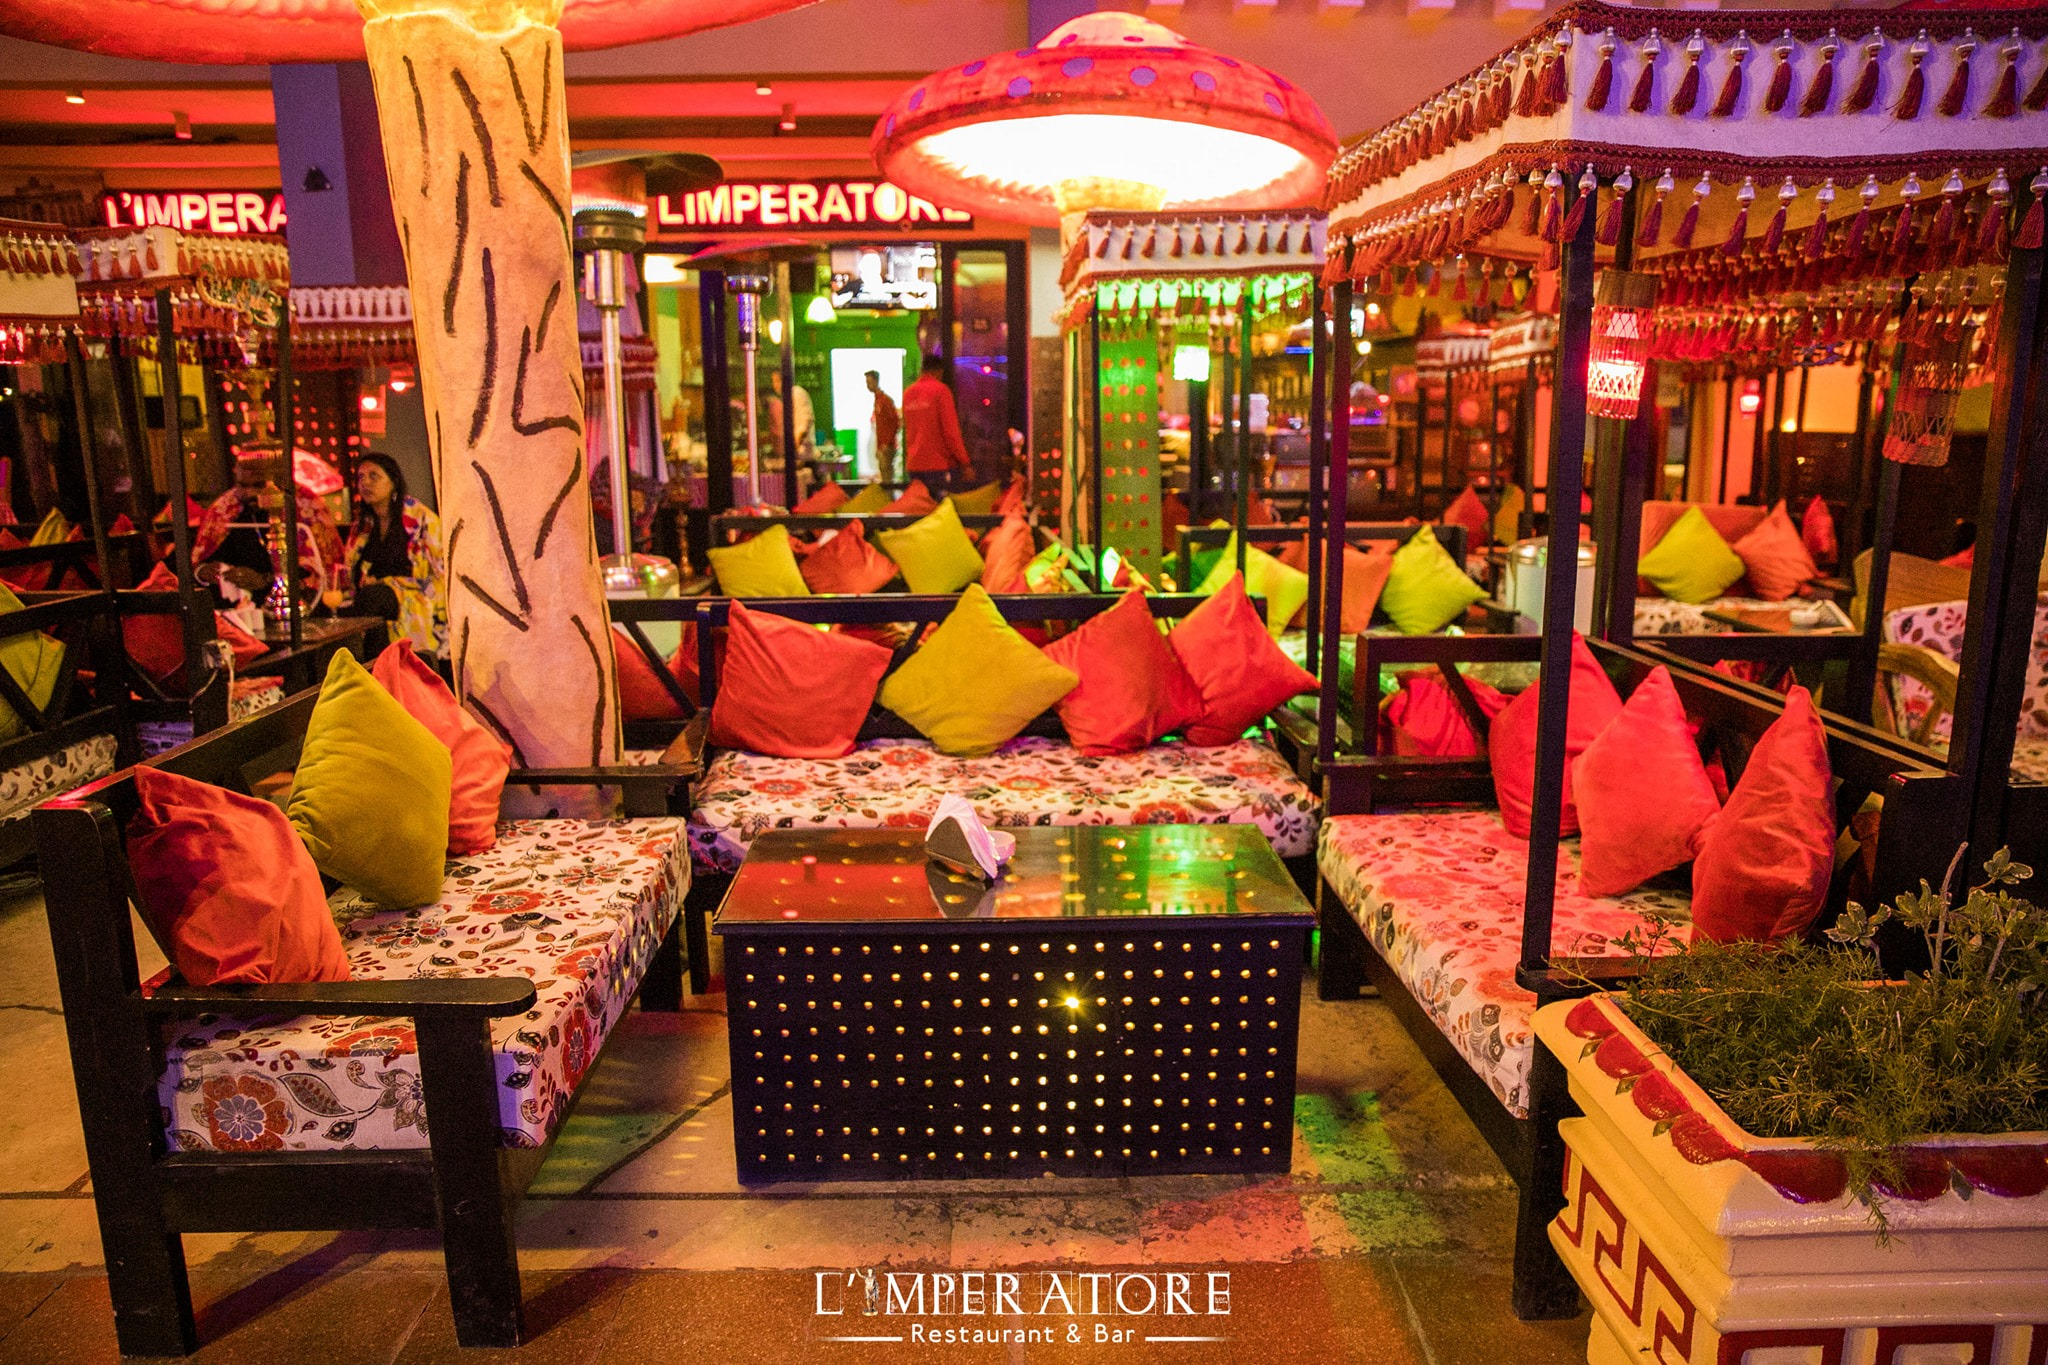 Duiken Hurghada Seagate, eten in Hurghada, L'imperatore